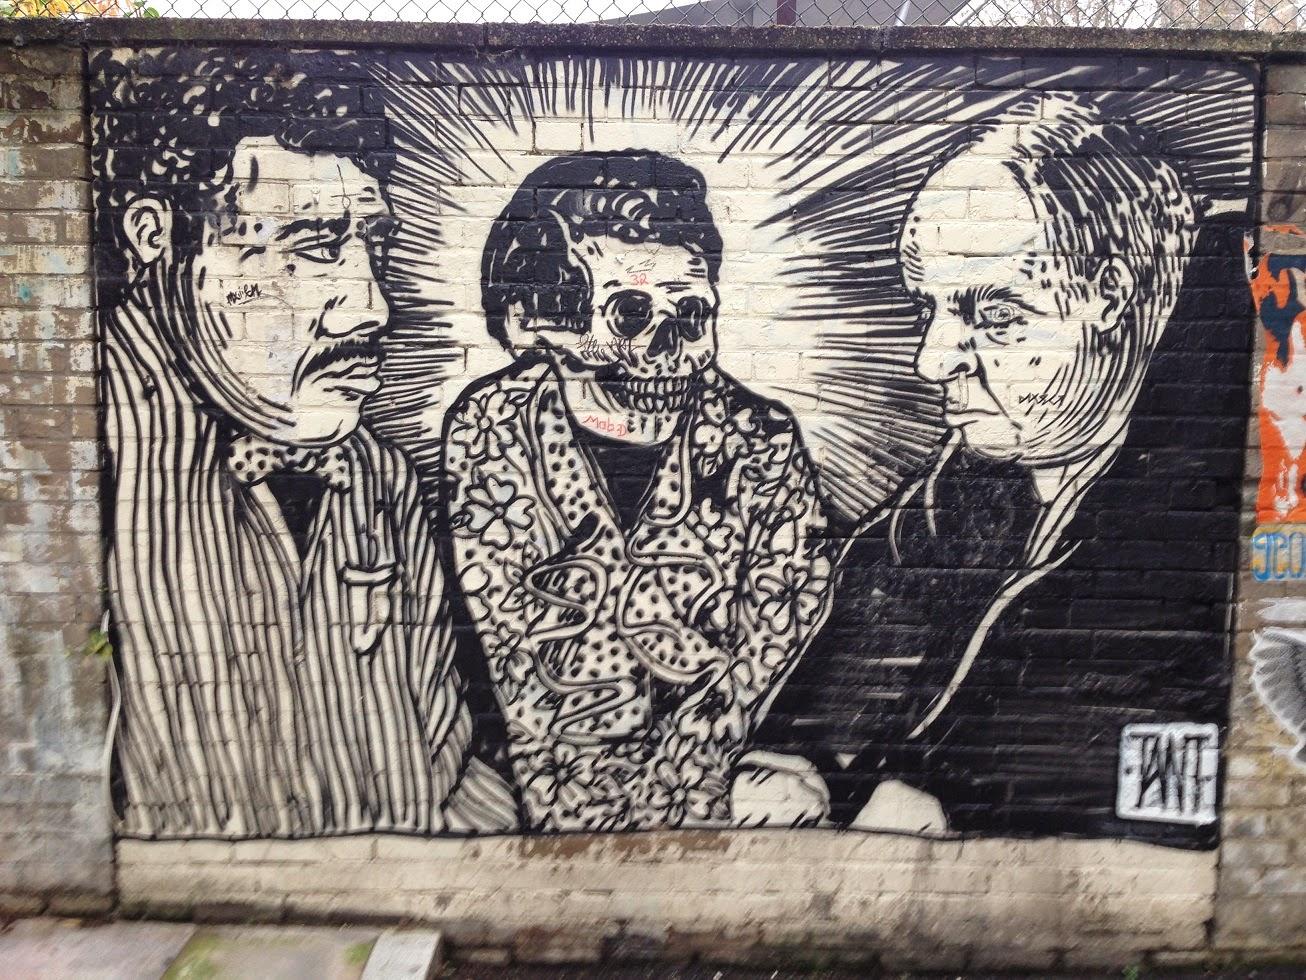 Street Art, Shoreditch, London N1